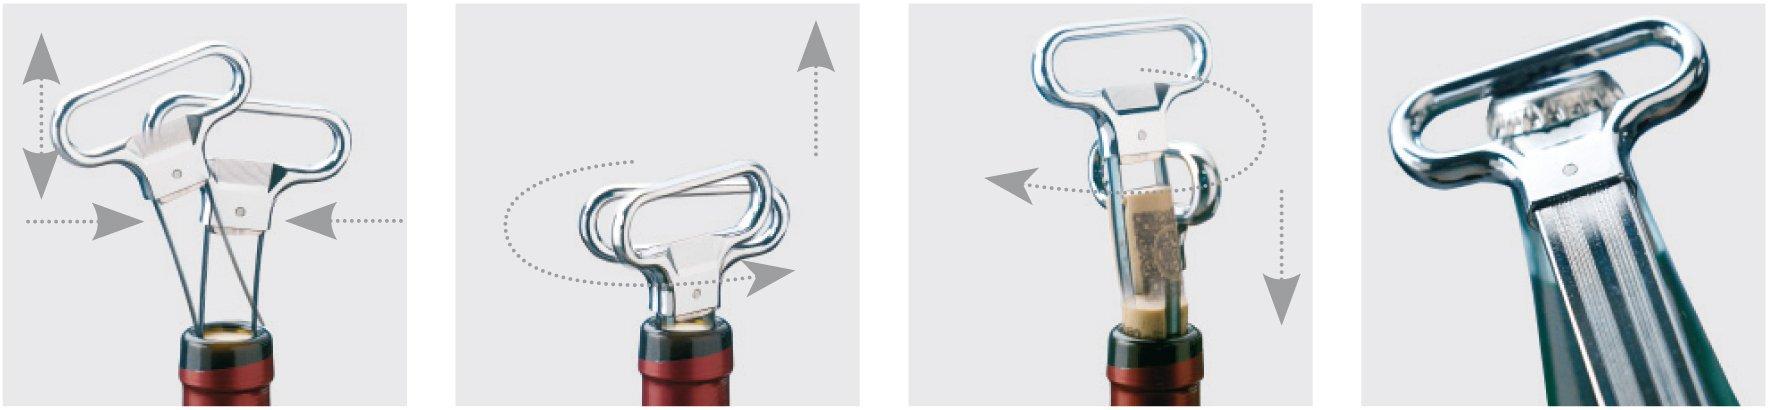 Monopol''Ah-so'' Bottle Opener and Corker by Westmark (Image #1)